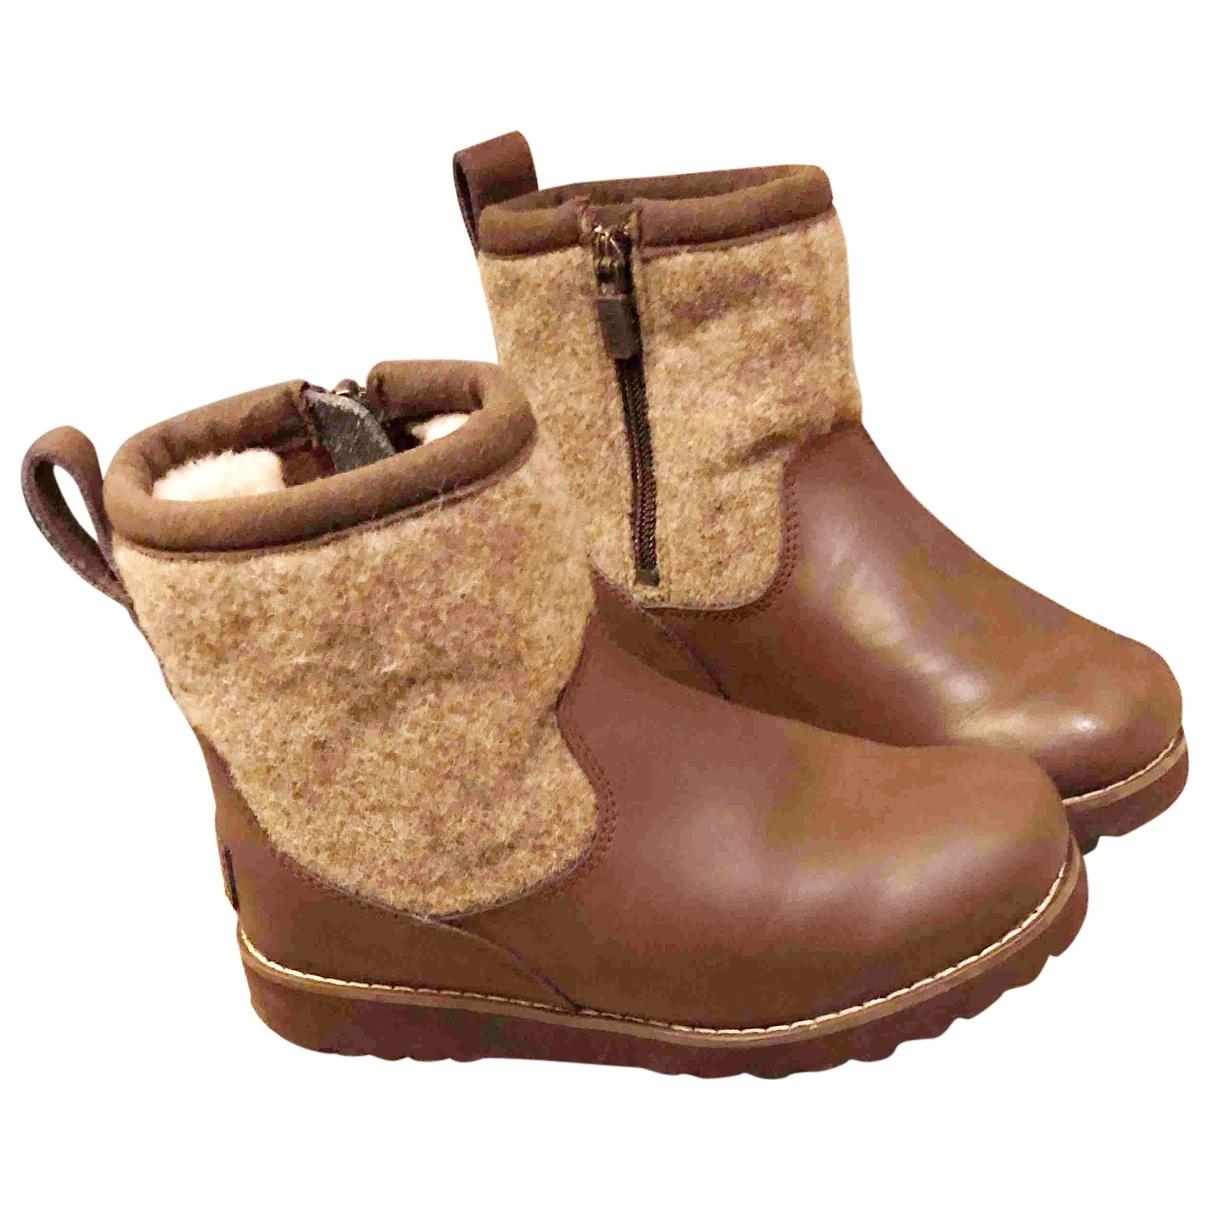 Ugg - Bottes.Bottines   pour enfant en cuir - marron